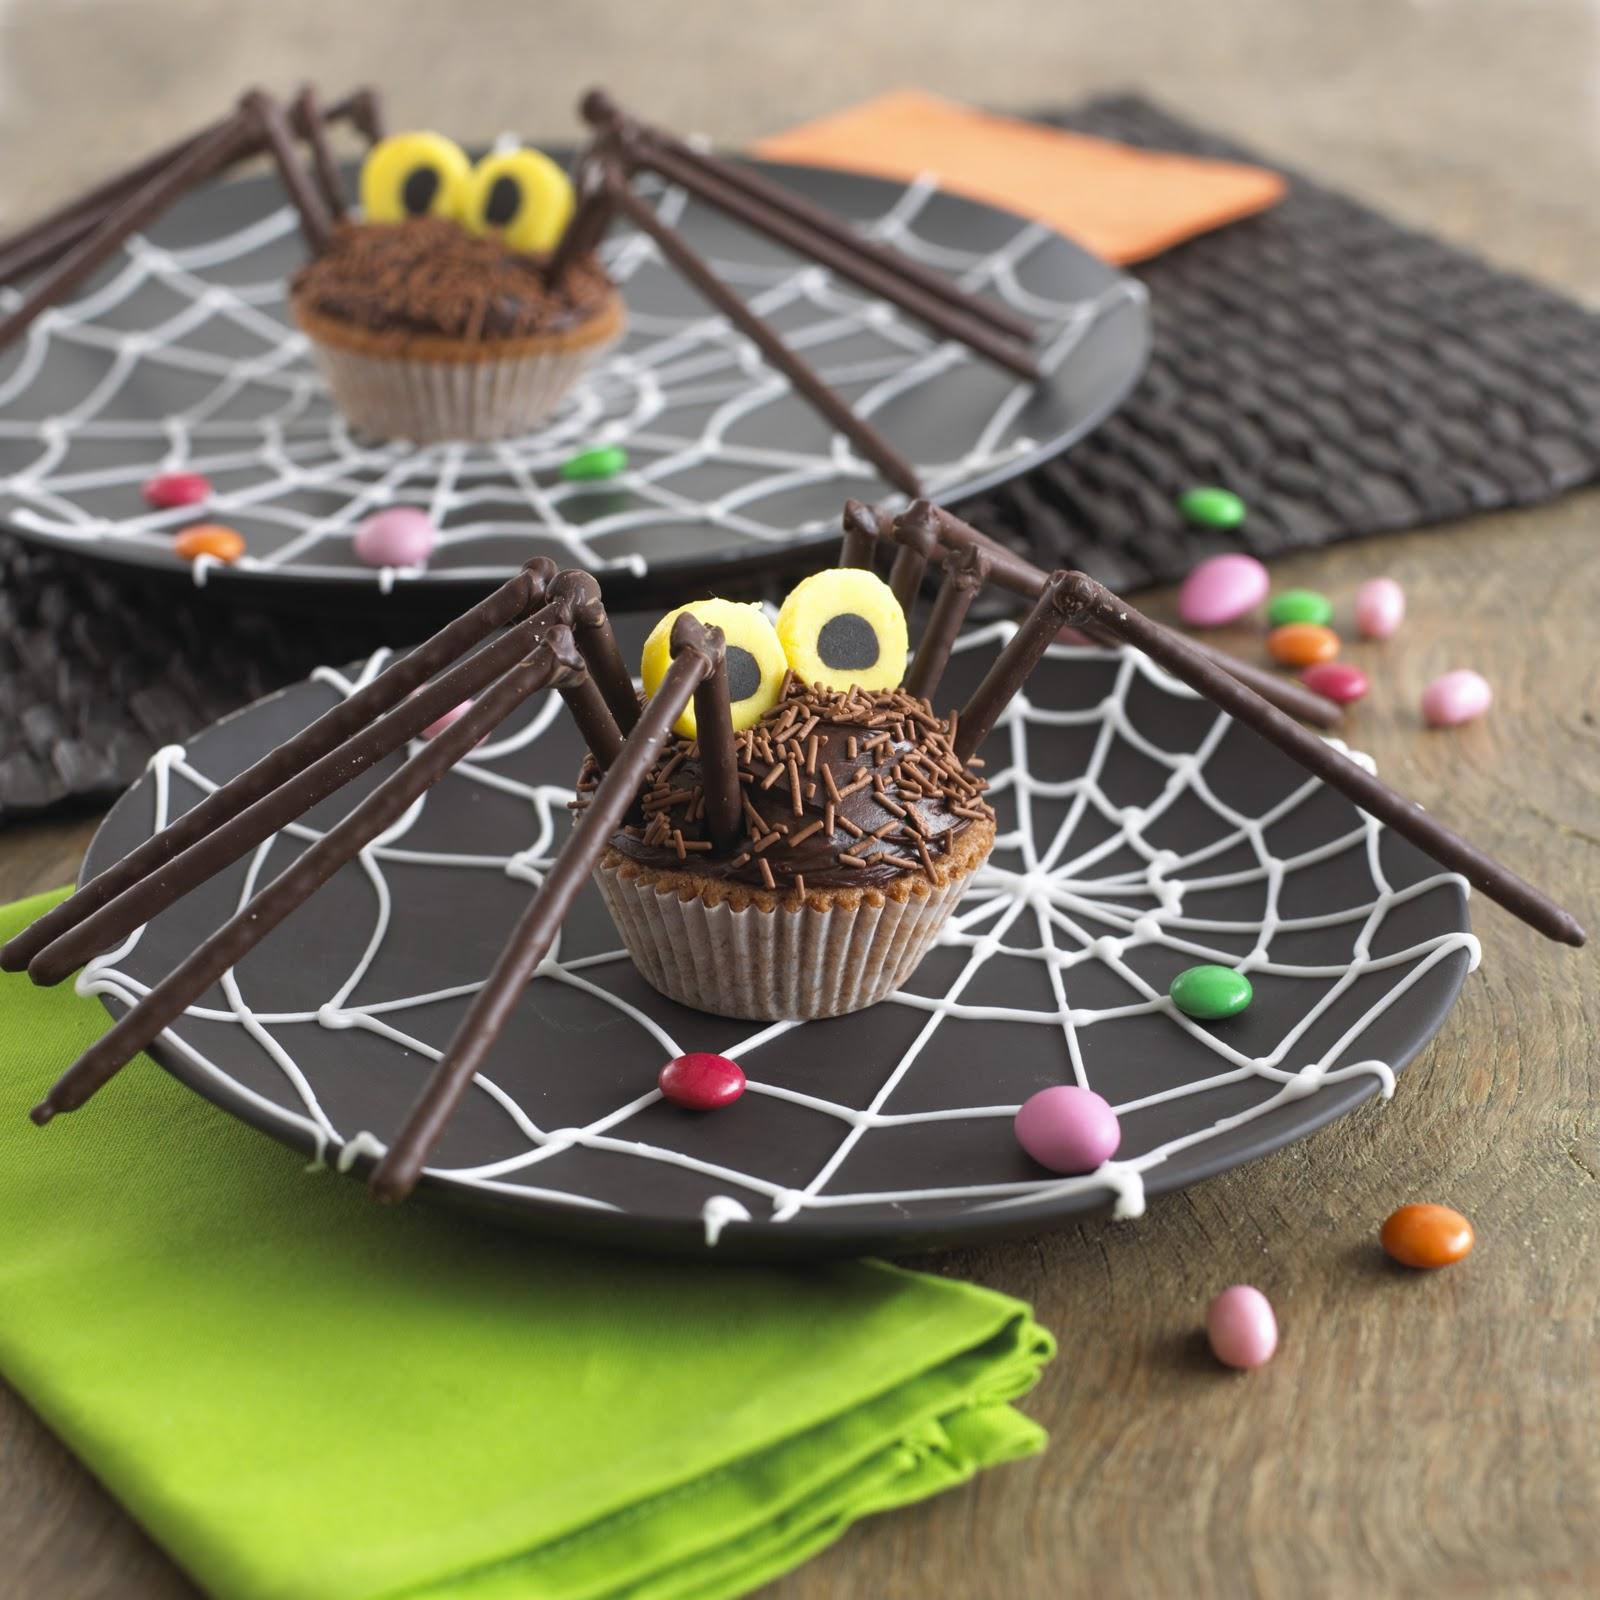 Recipe Linky: Homemade Halloween Treats From Annabel